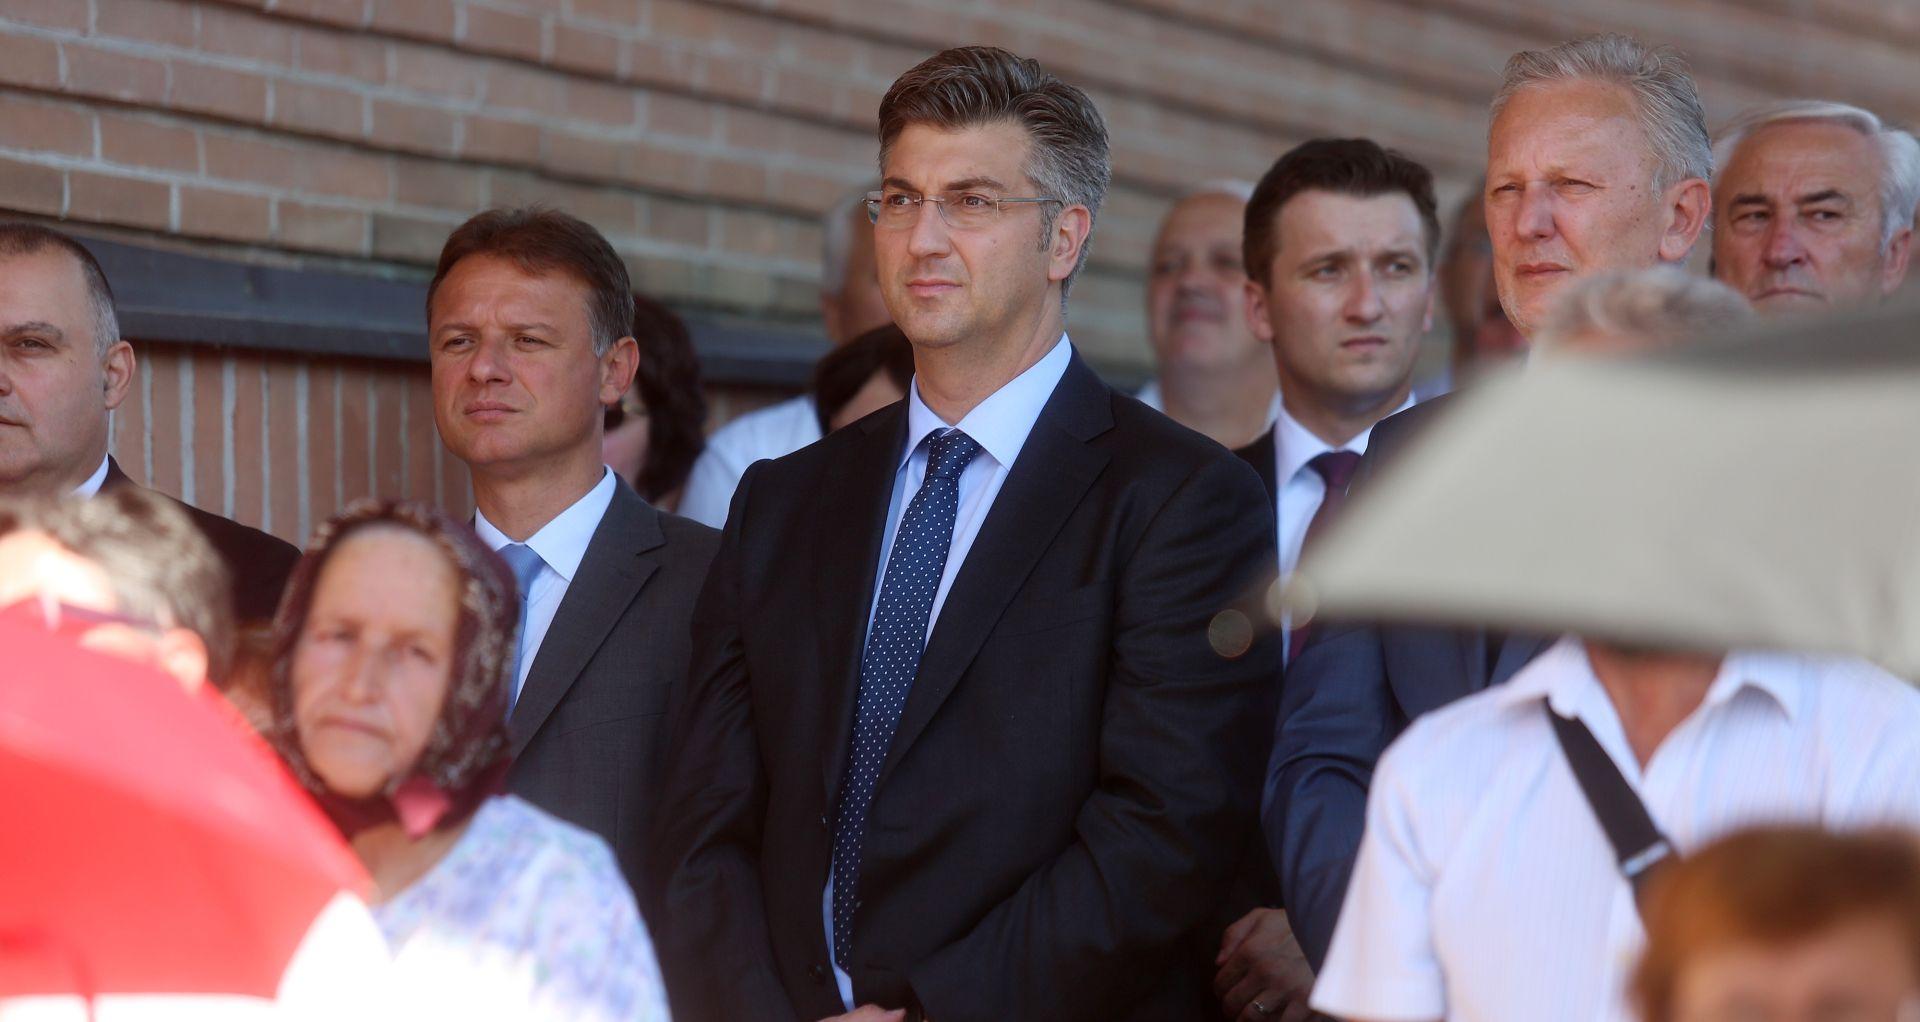 ANDREJ PLENKOVIĆ 'Financiranje kampanje zakonito, odgovorno i transparentno'